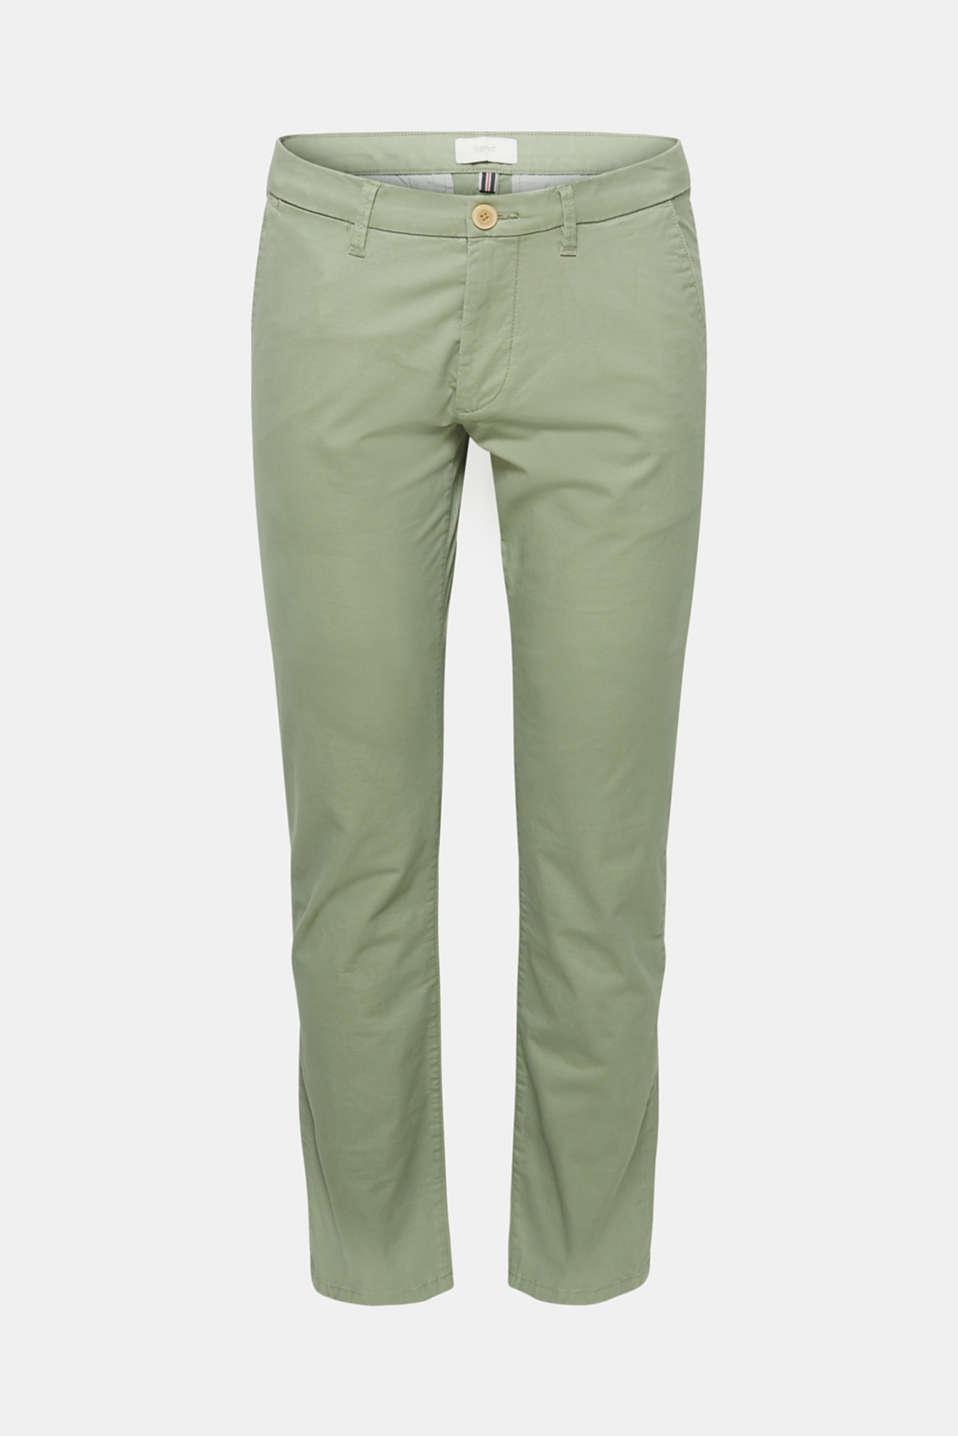 Pants woven Slim fit, LIGHT KHAKI, detail image number 4